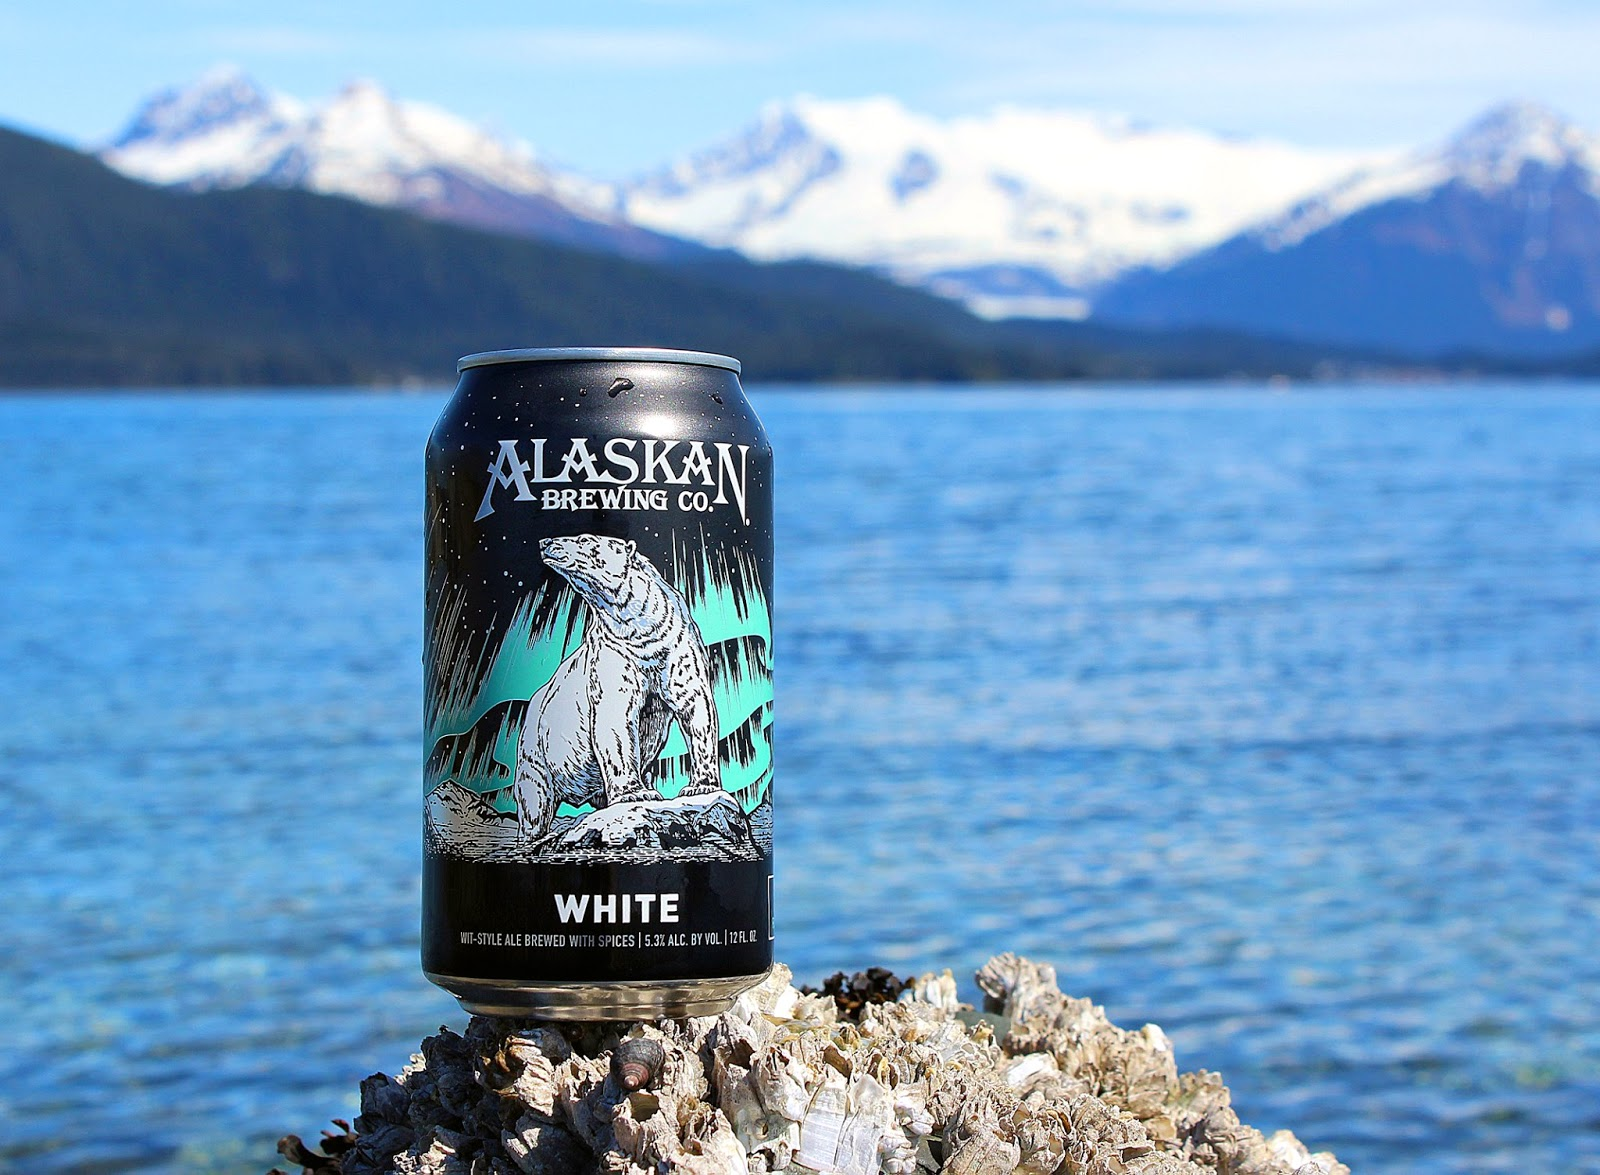 Beer & Branding: Alaskan Brewing